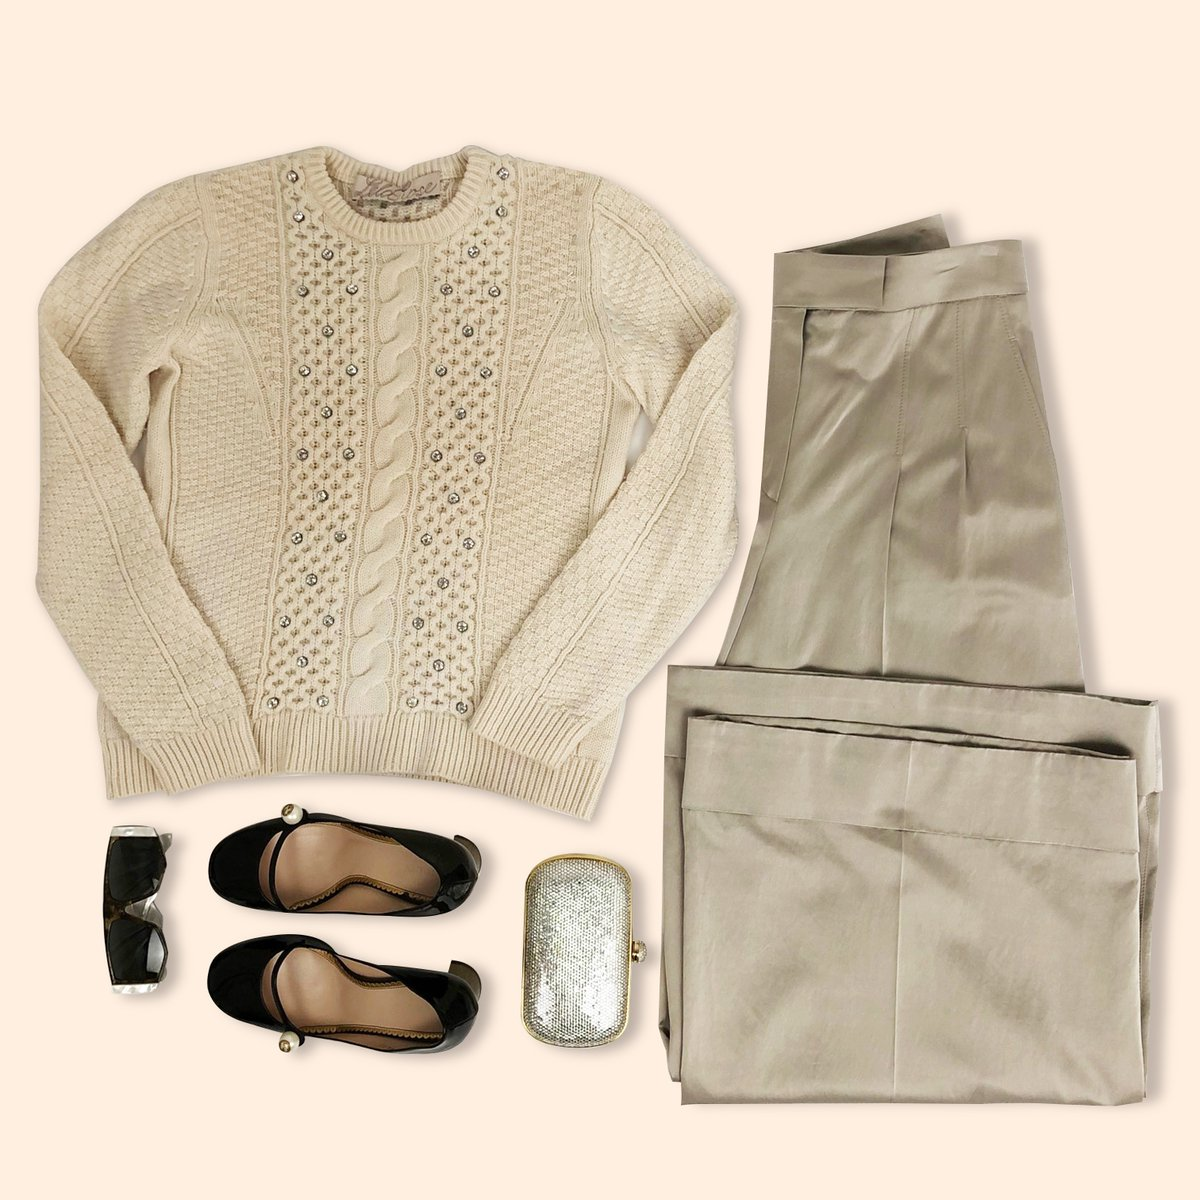 Beautiful in shades of beige. #LelaRose Sweater Sz. 6 $225 #BrunelloCucinelli Pants Sz. 8 $430 #Gucci Heels Sz. 39 $455 #Loewe Sunglasses $225 #JudithLeiber Clutch $685pic.twitter.com/tWTDg24R7m